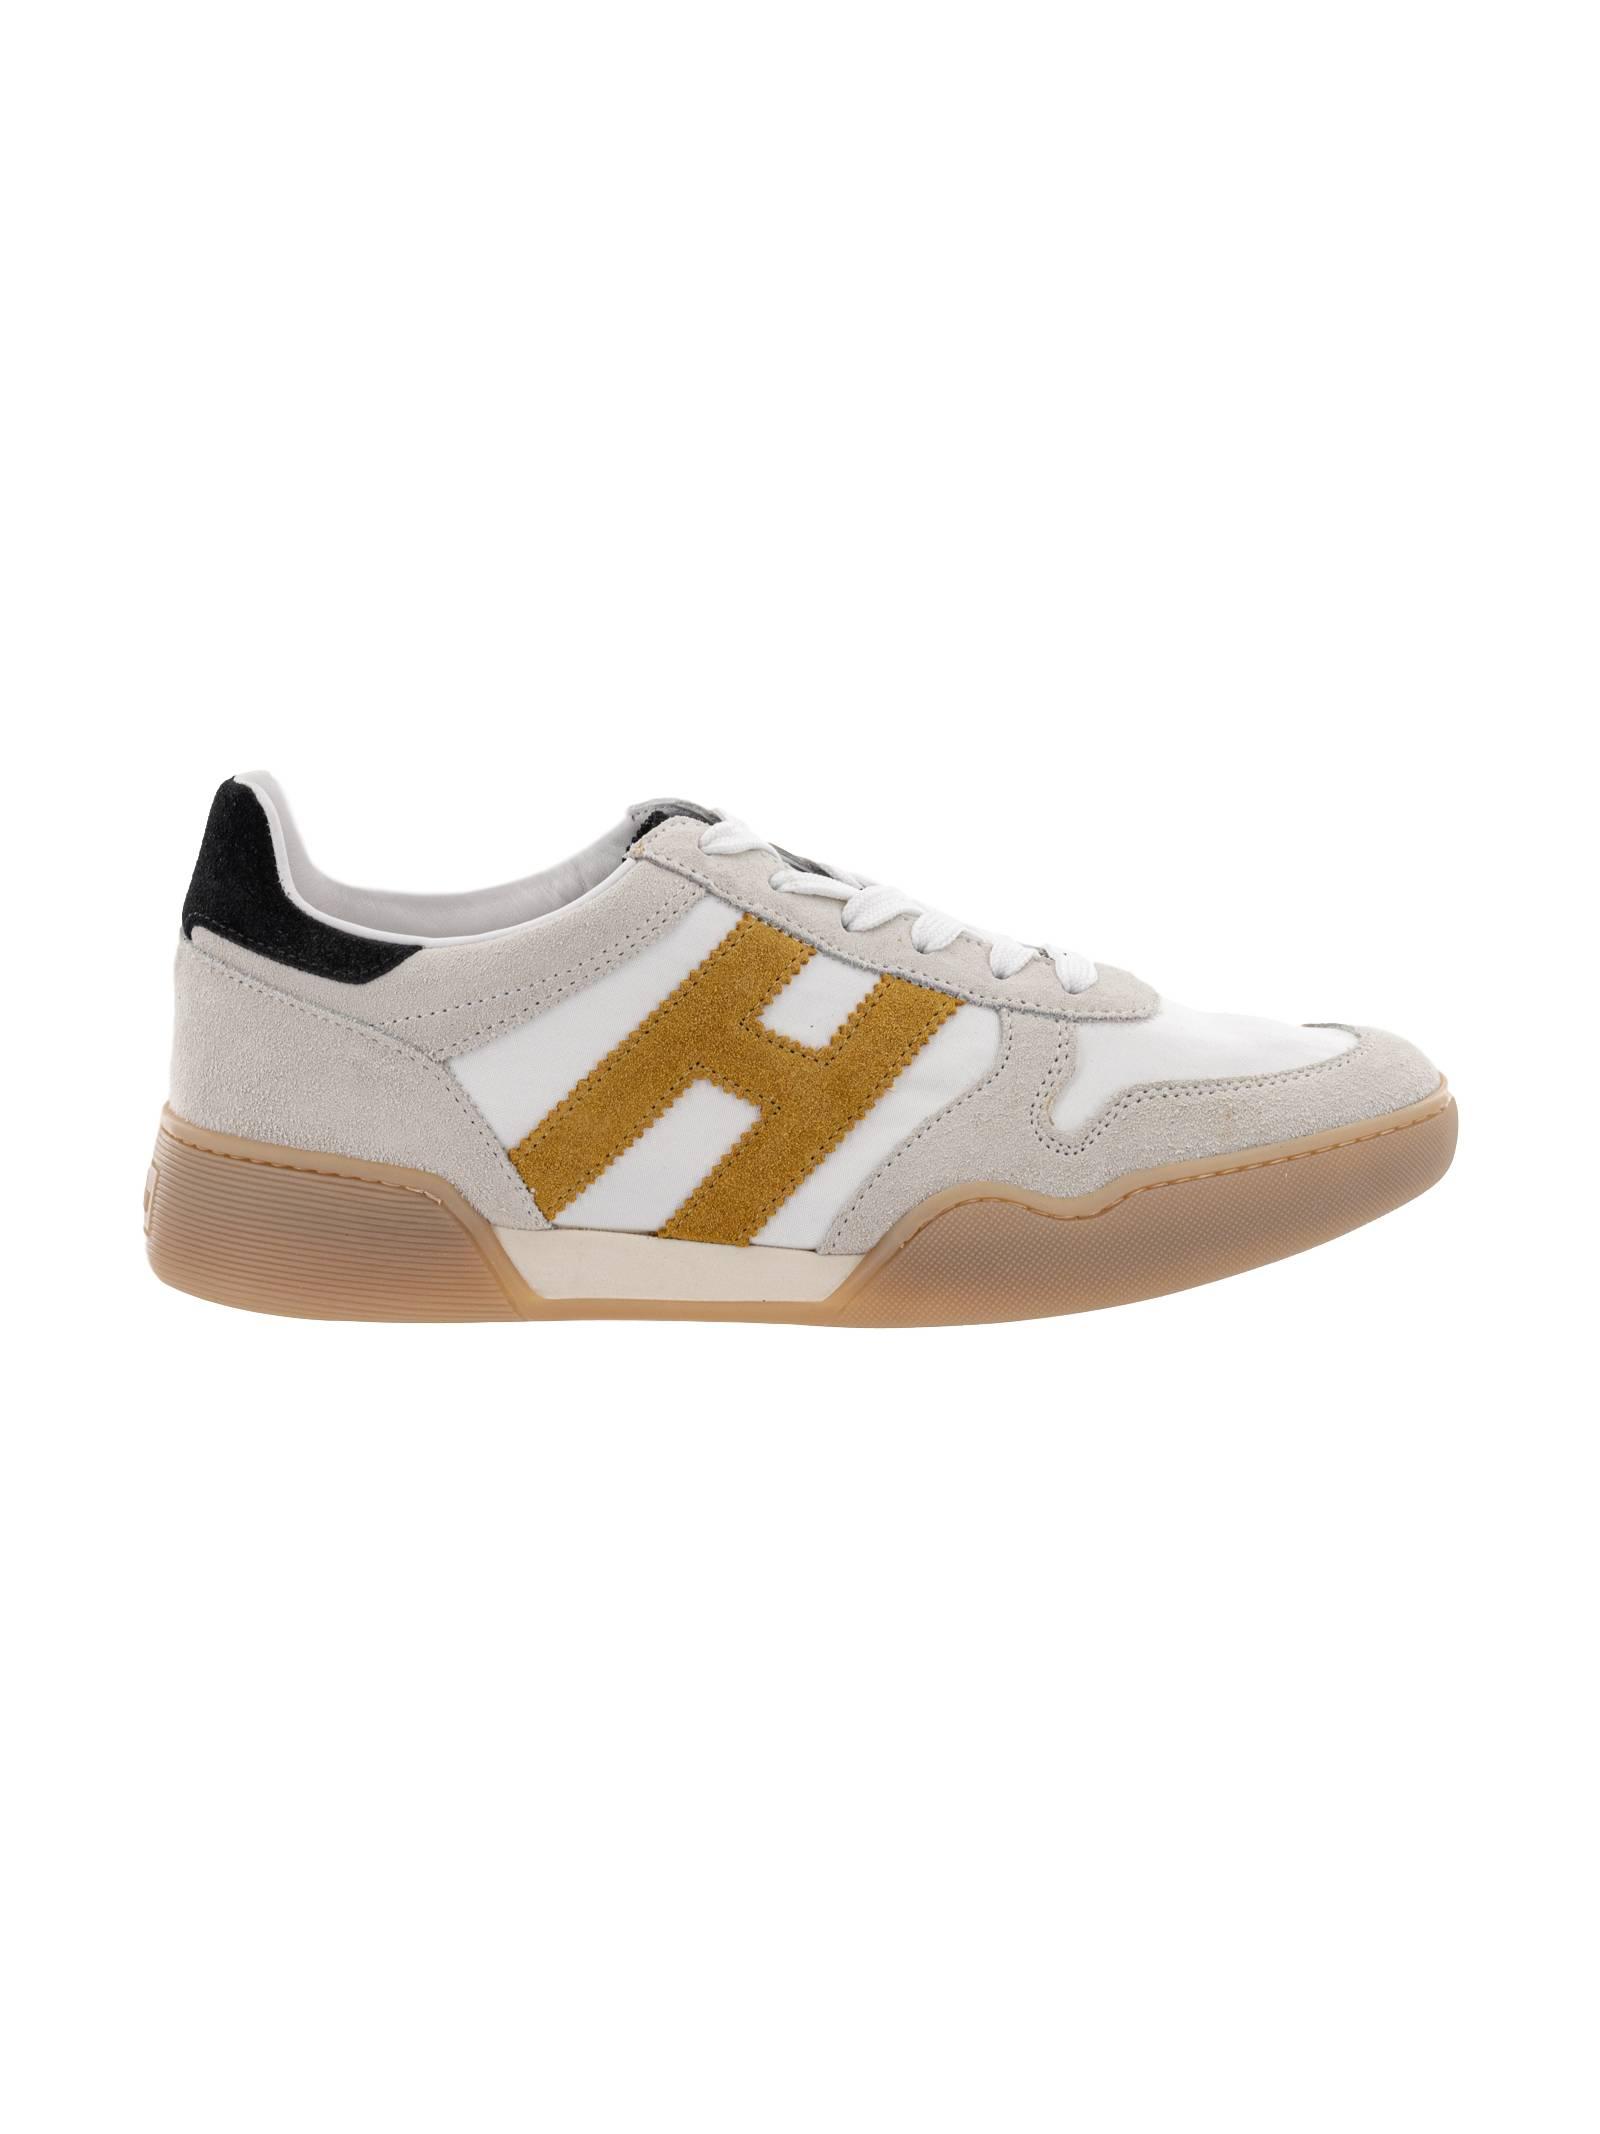 Sneakers Hogan HOGAN | 5032295 | HXM3570AC40N3Q50BN